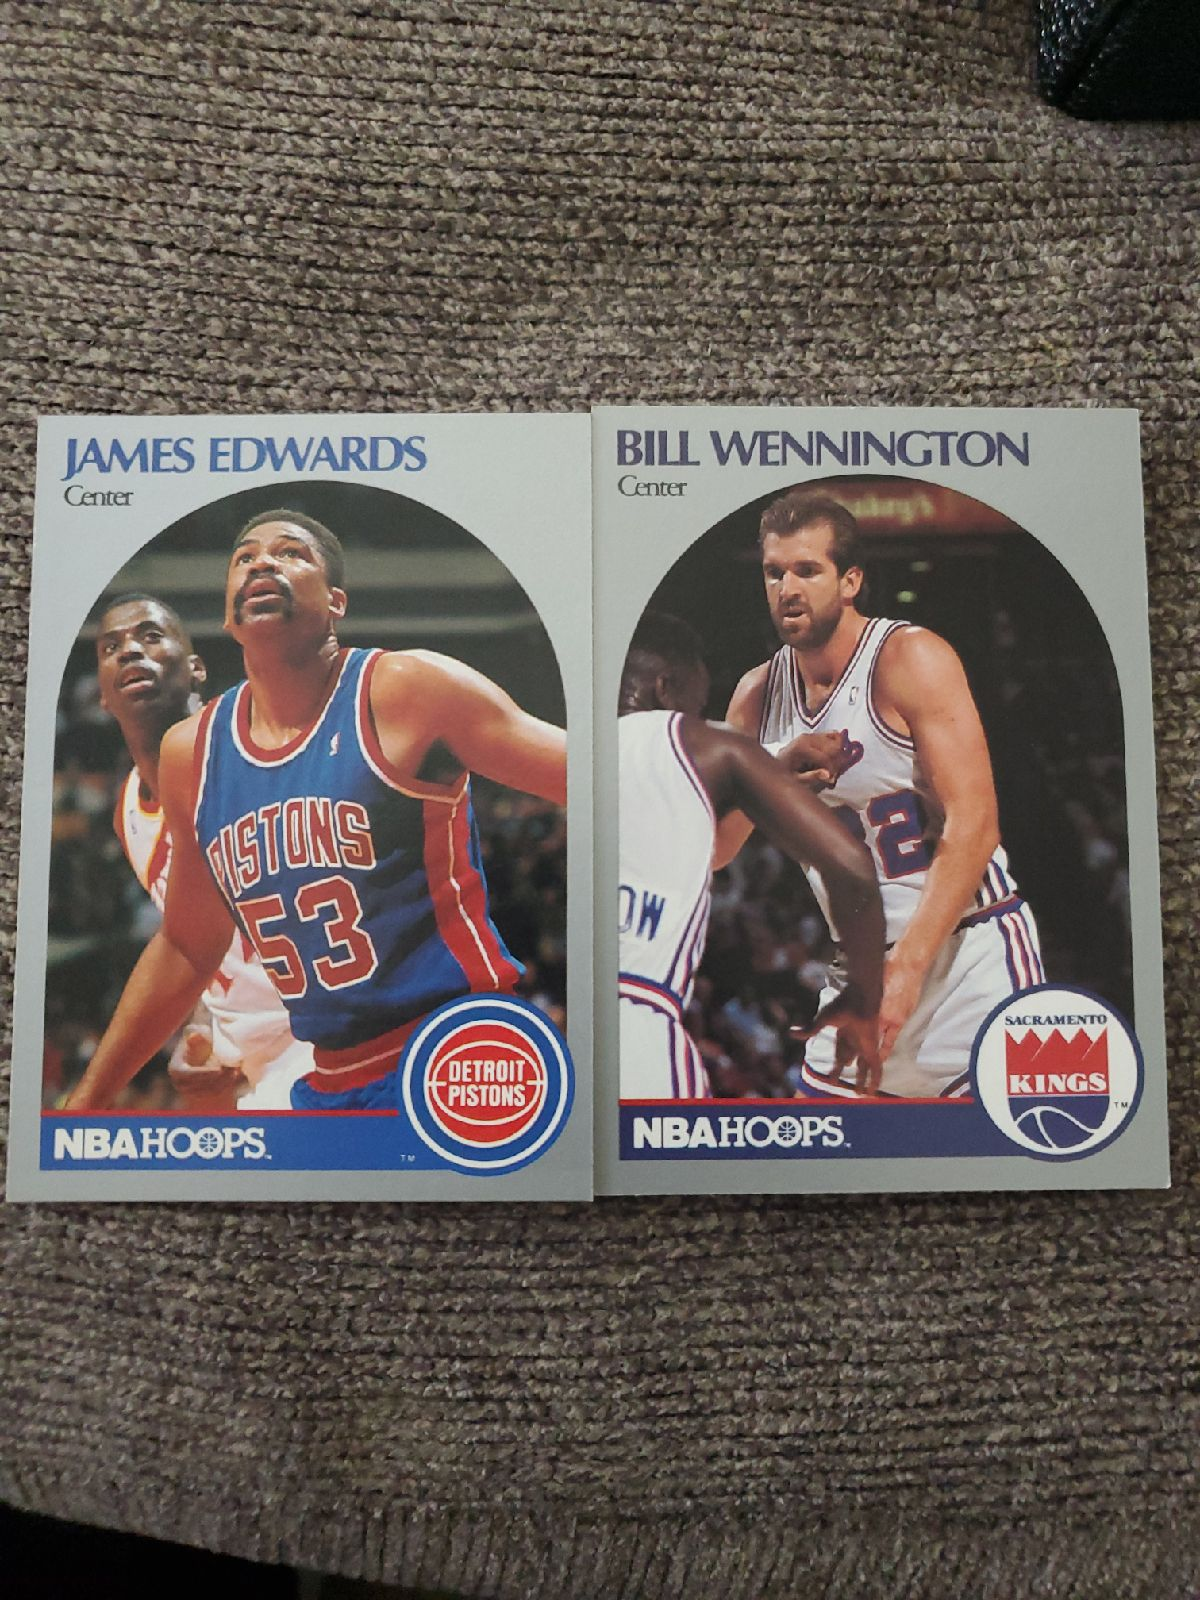 80s NBA Hoops cards